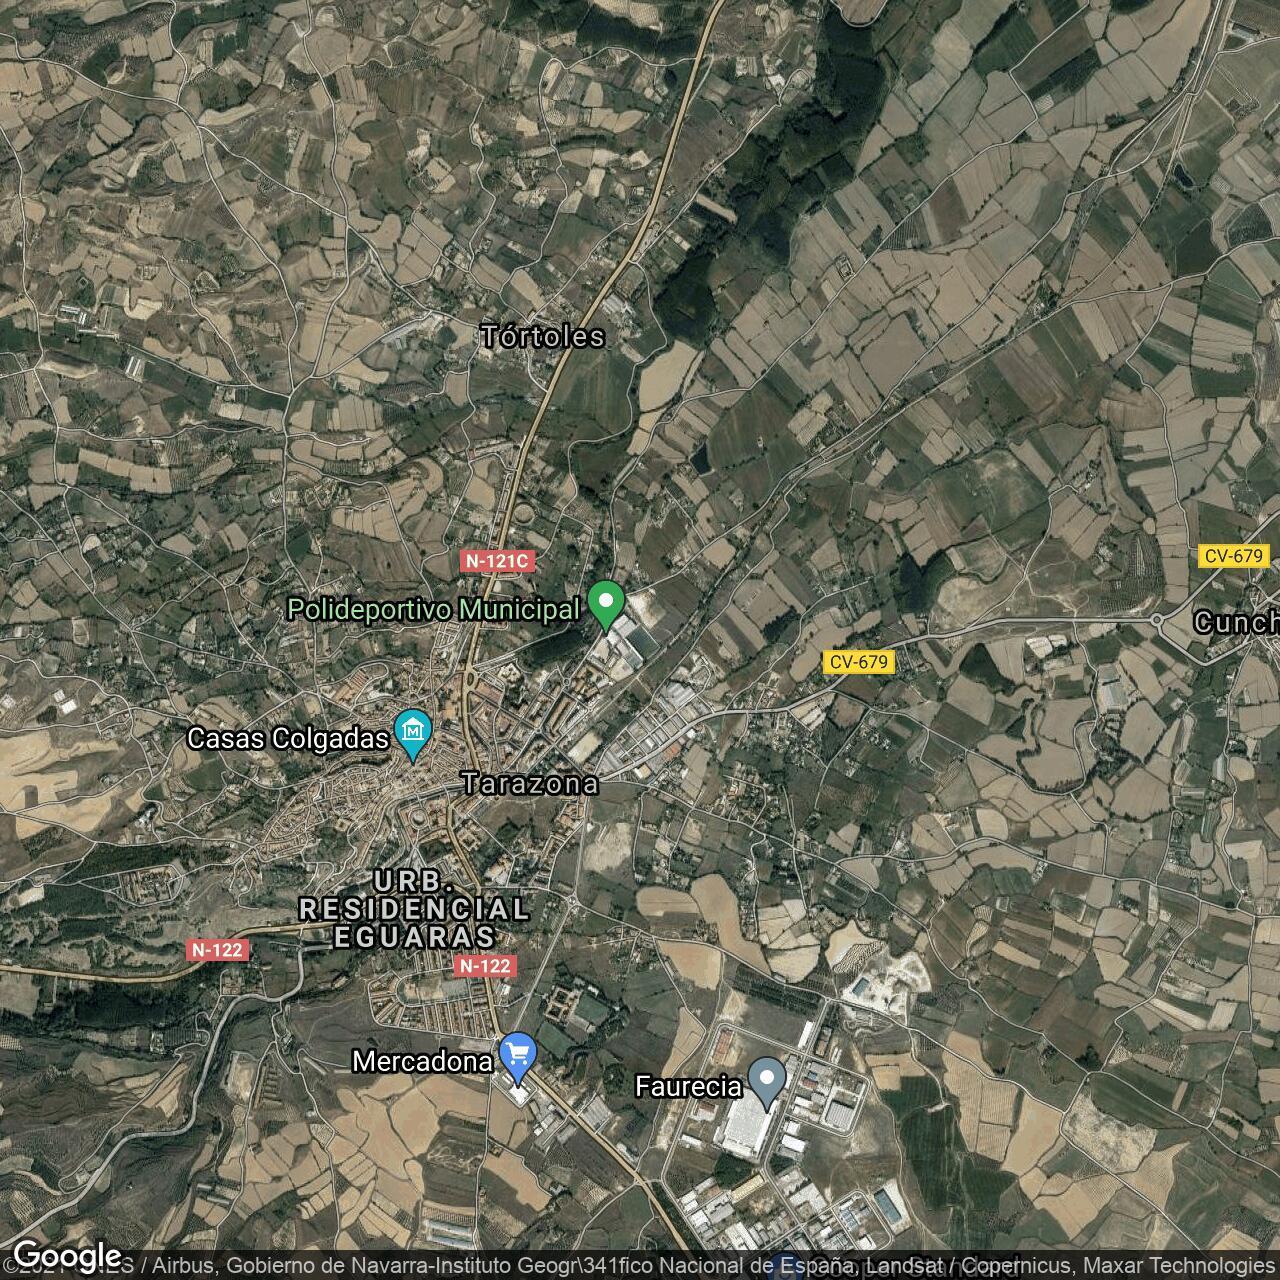 Estadio Municipal De Tarazona Home To Tarazona Football Ground Map